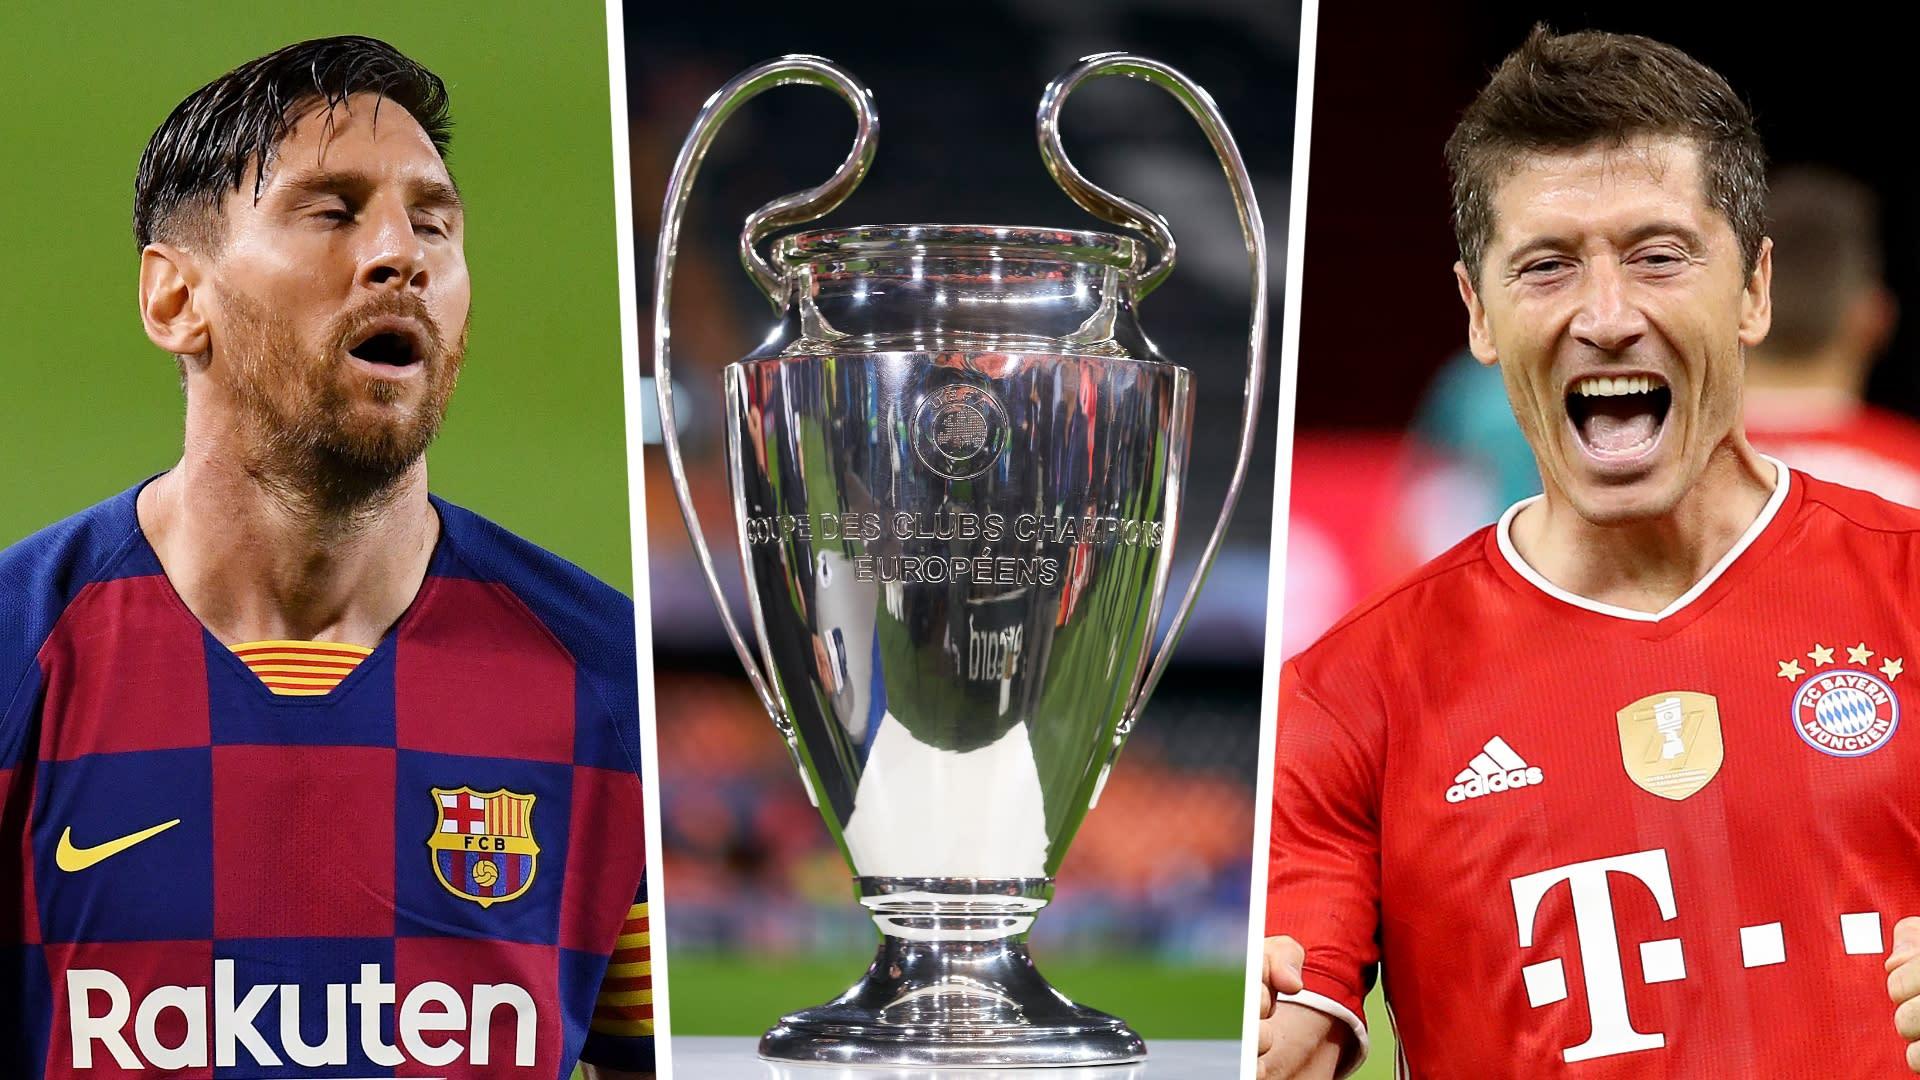 Lewandowski will beat Messi to player of the year if Bayern knock out Barcelona – Rivaldo